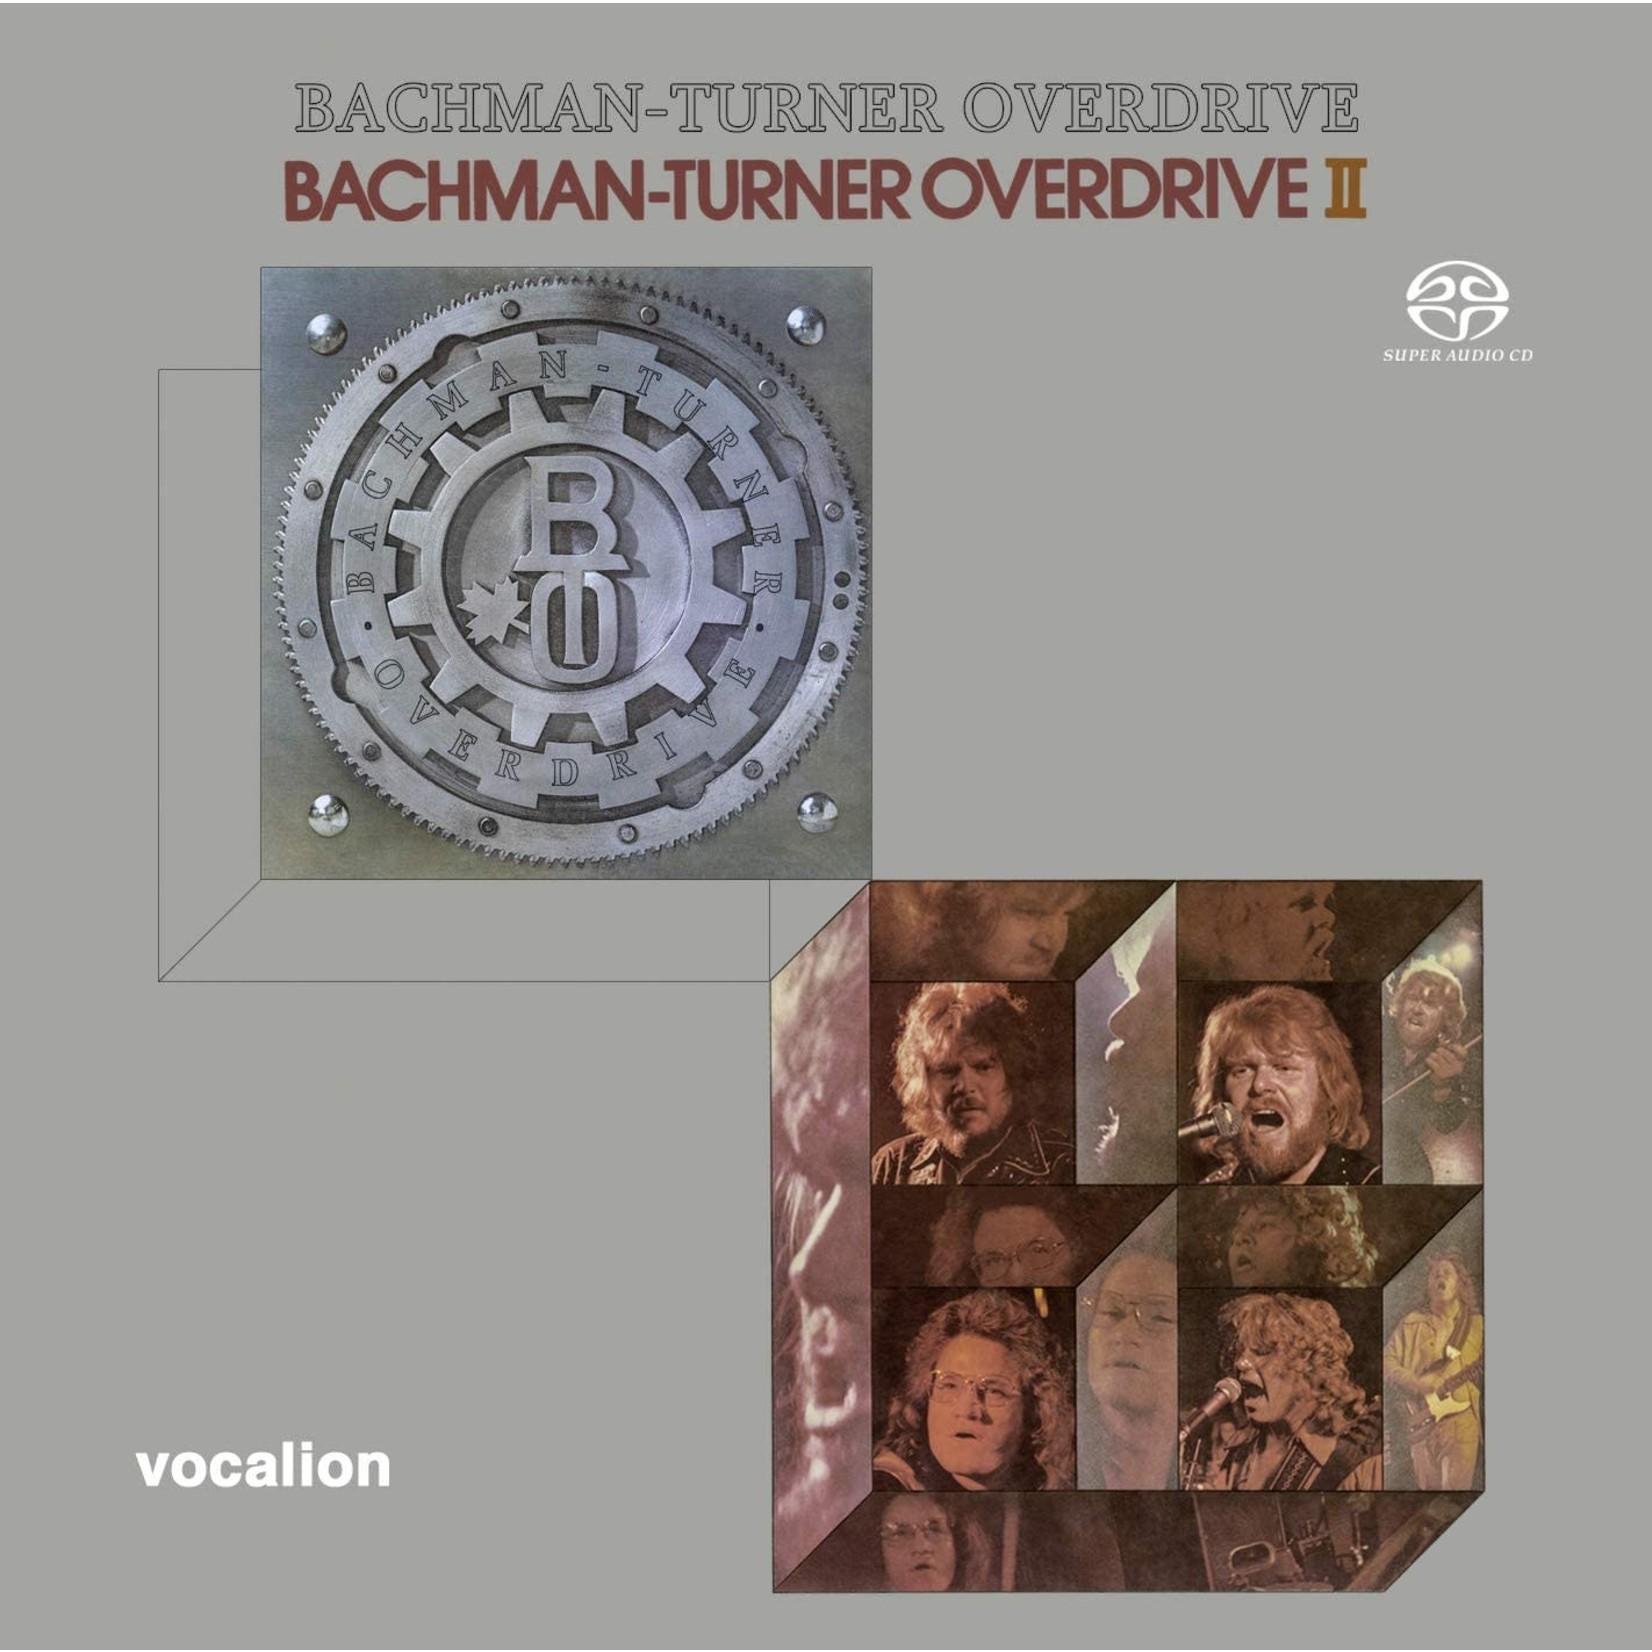 Compact Disc Bachman-Turner Overdrive & Bachman-Turner Overdrive II [SACD Hybrid Multi-Channel]